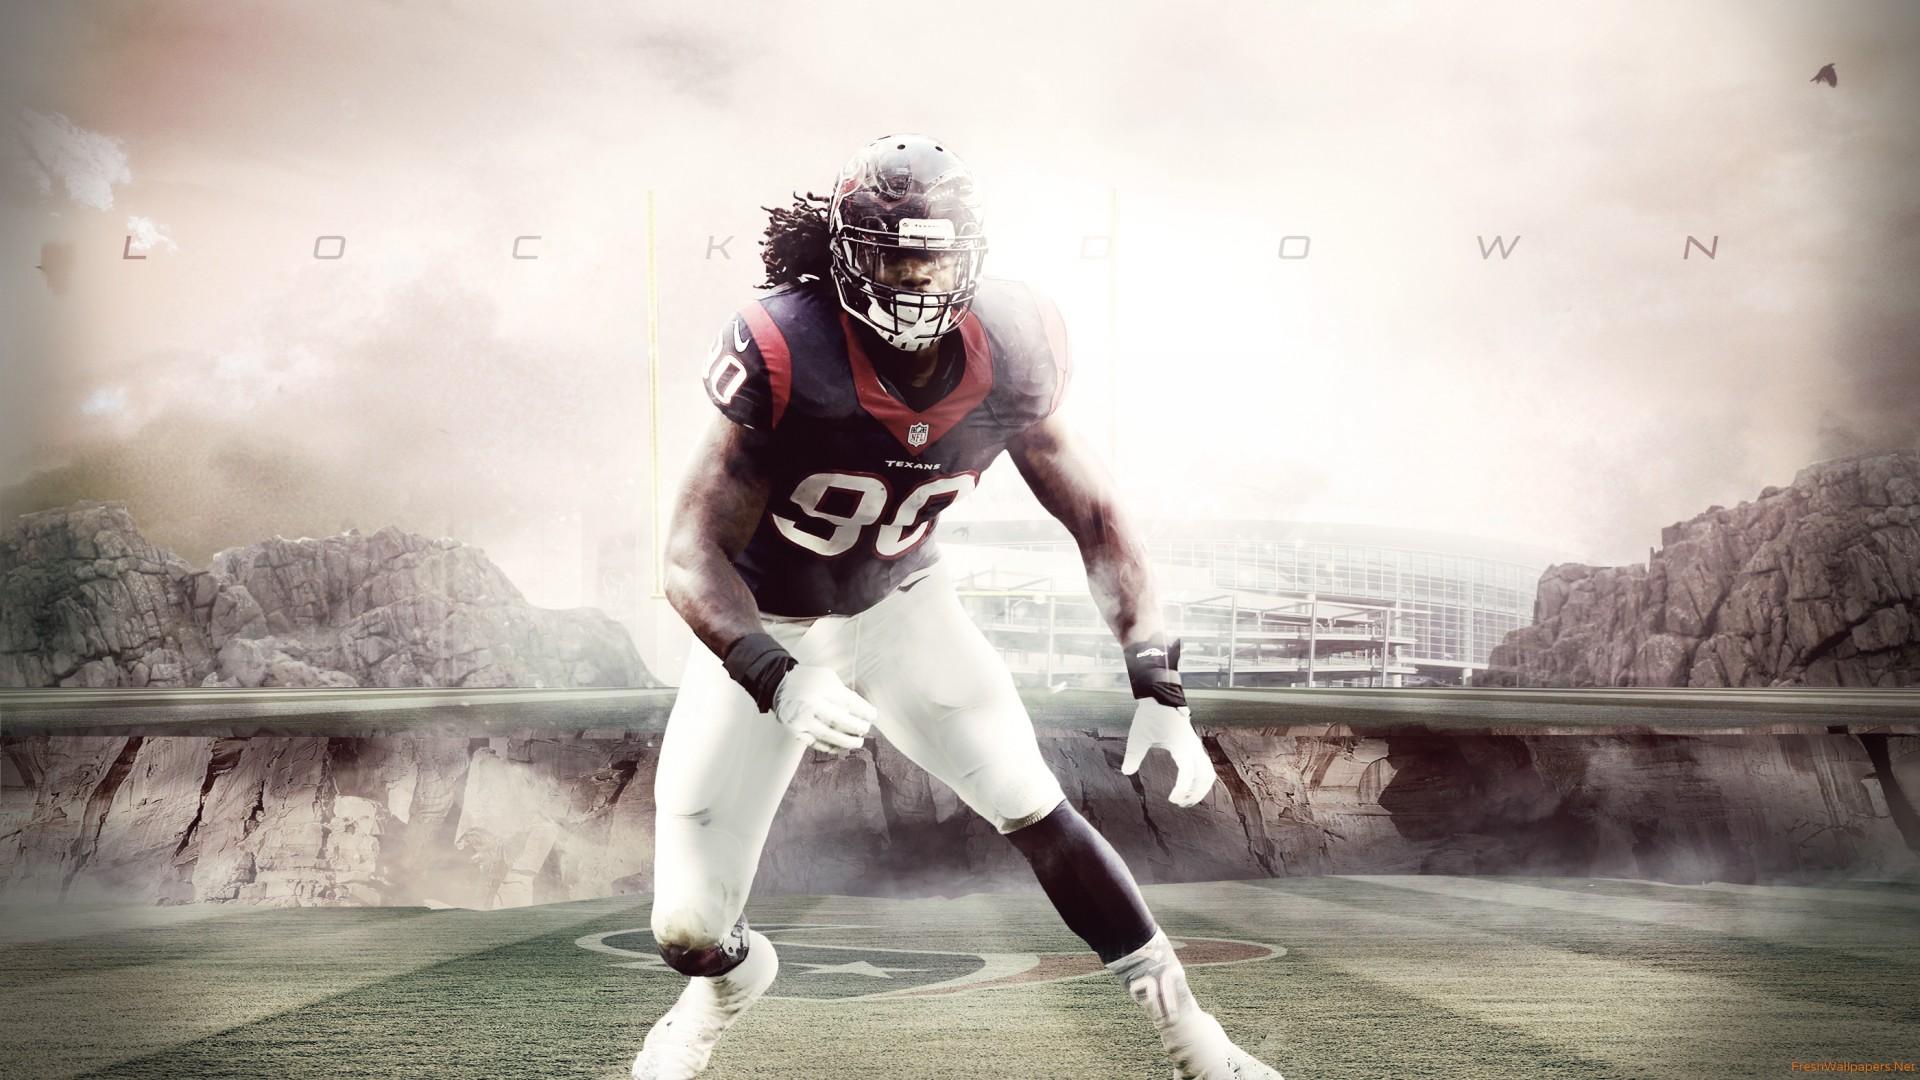 Jadeveon Clowney 2015 Houston Texans NFL wallpapers Freshwallpapers 1920x1080